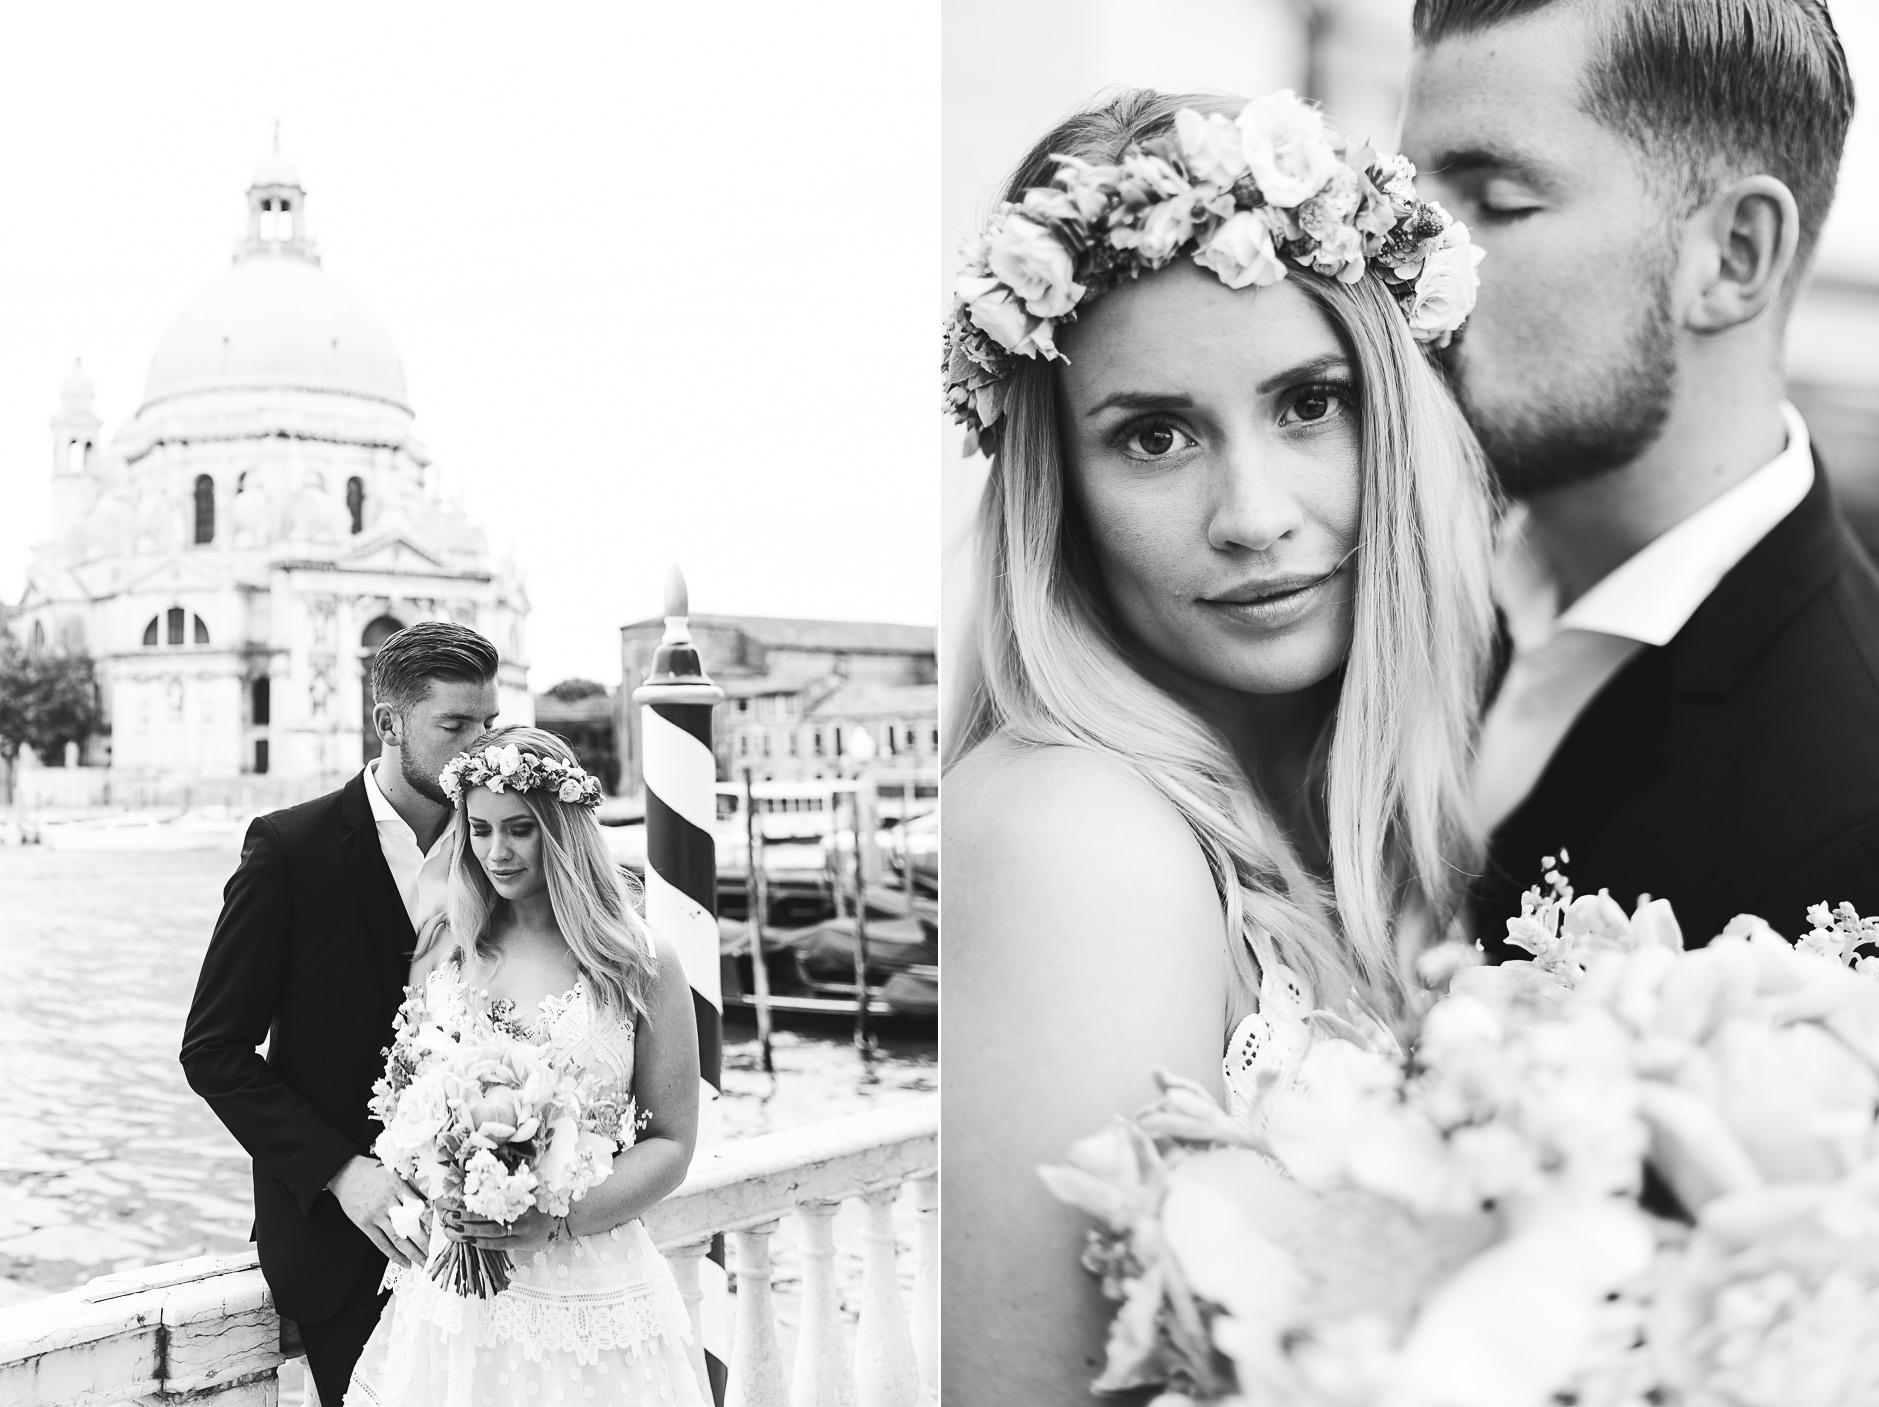 Hochzeitsfotograf Le Hai Linh Boho Chic After Wedding Shooting Venedig Timo Horn 1.FC Koeln 033.jpg